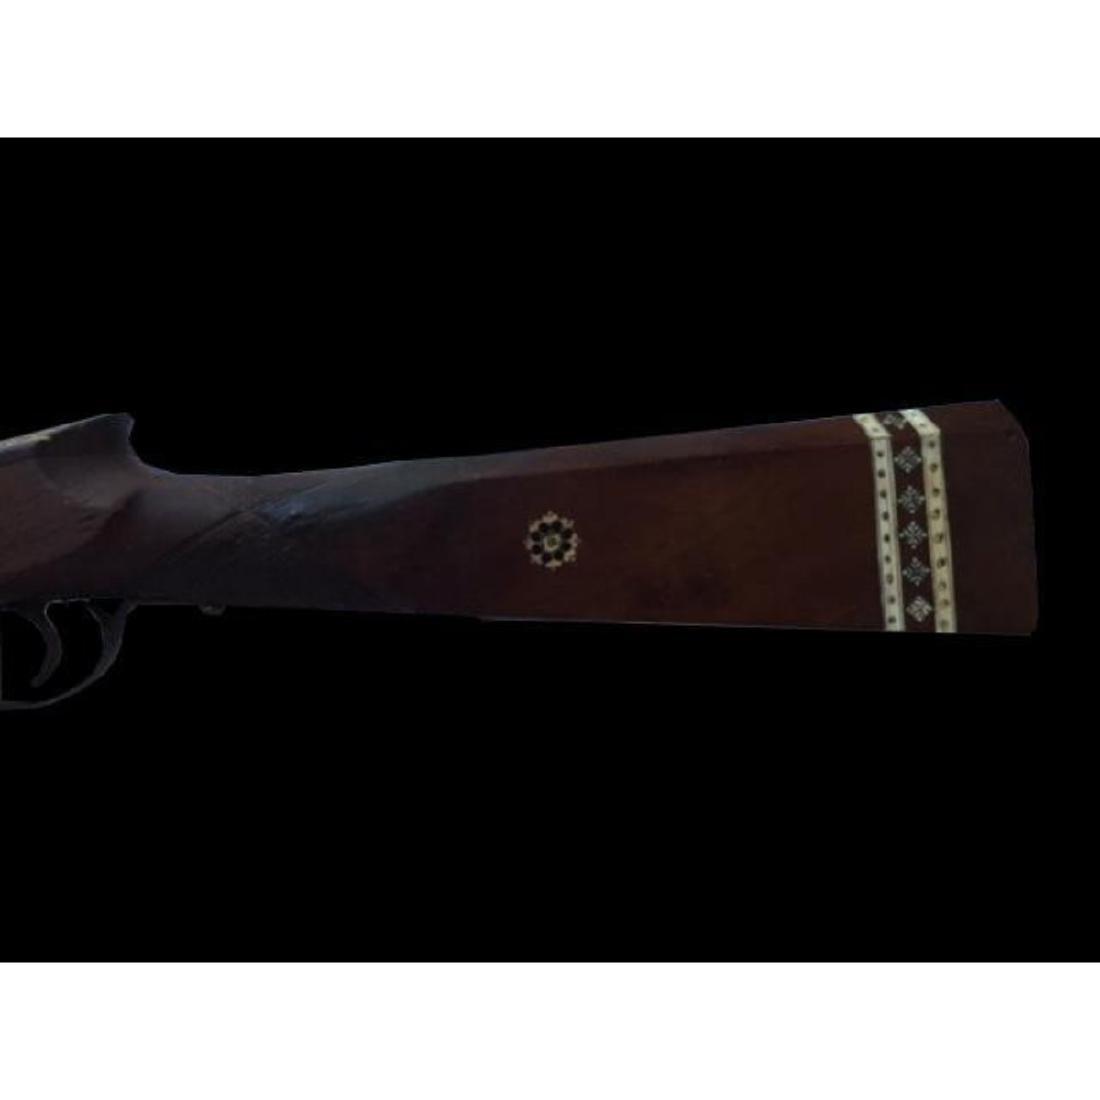 c1790 .700 Flintlock Rifle - 4